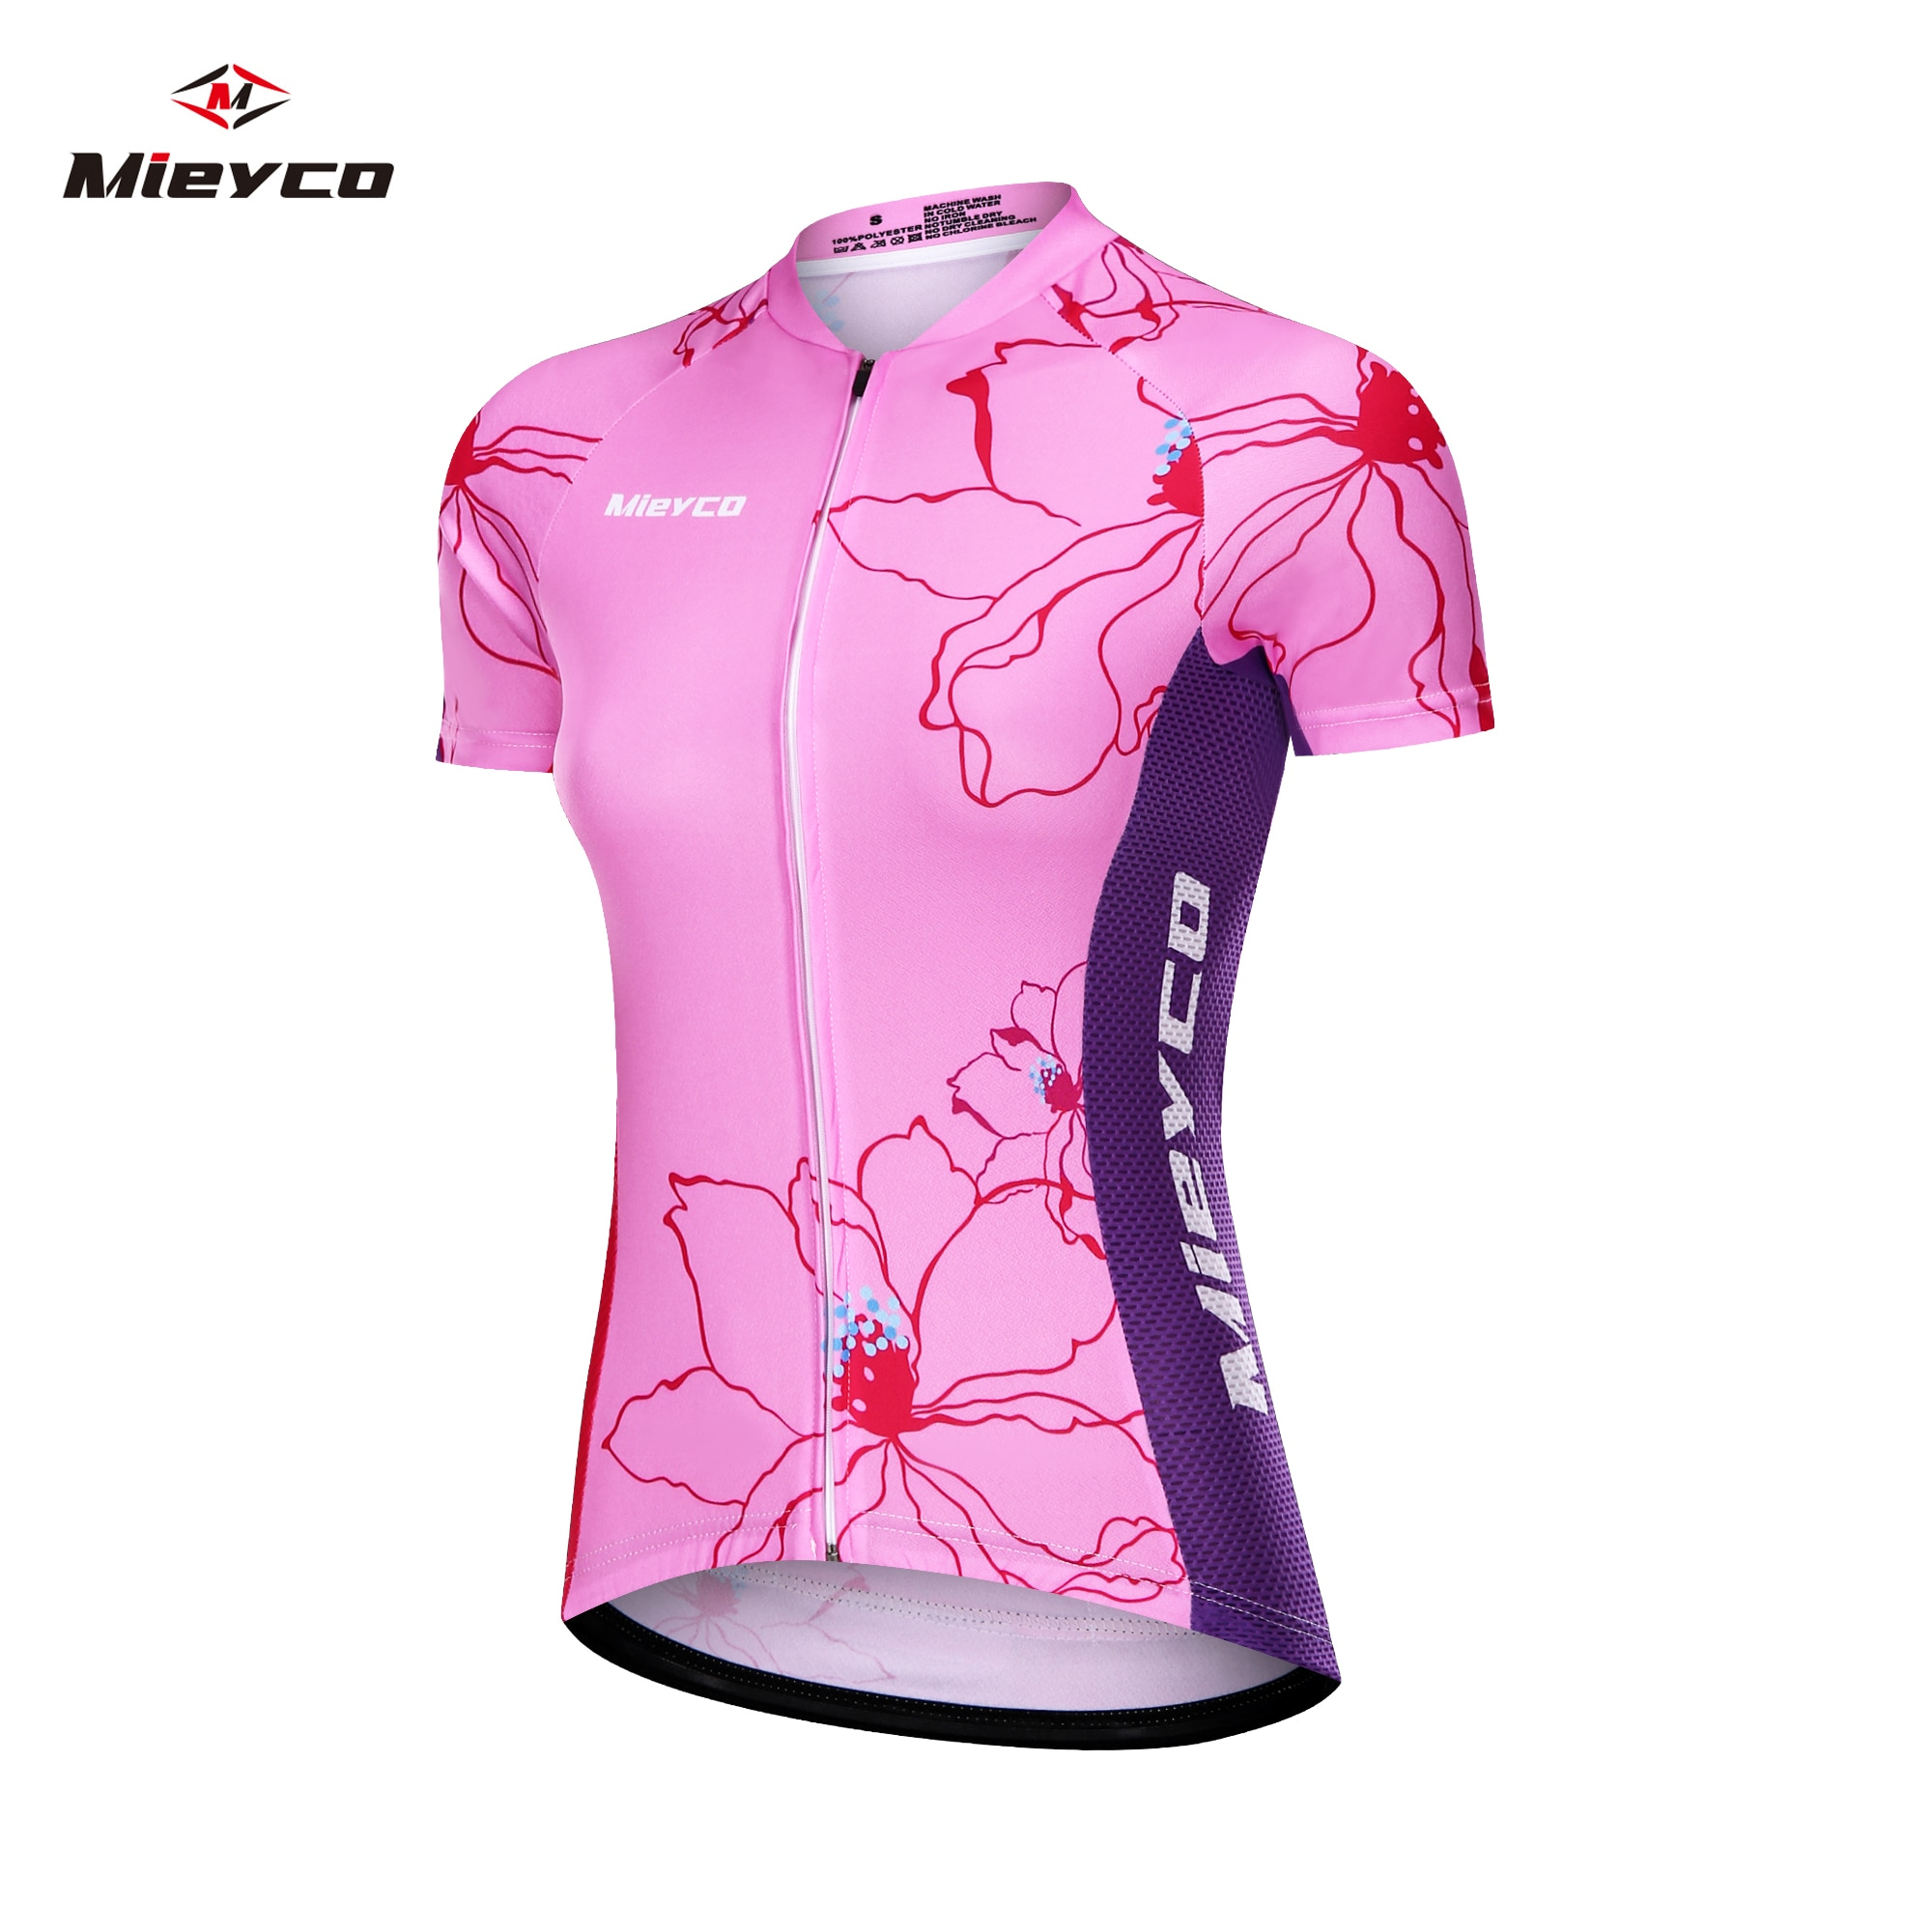 Conjunto De Ropa De Ciclismo Retro para Mujer, Jersey para Motocross, Maillot...